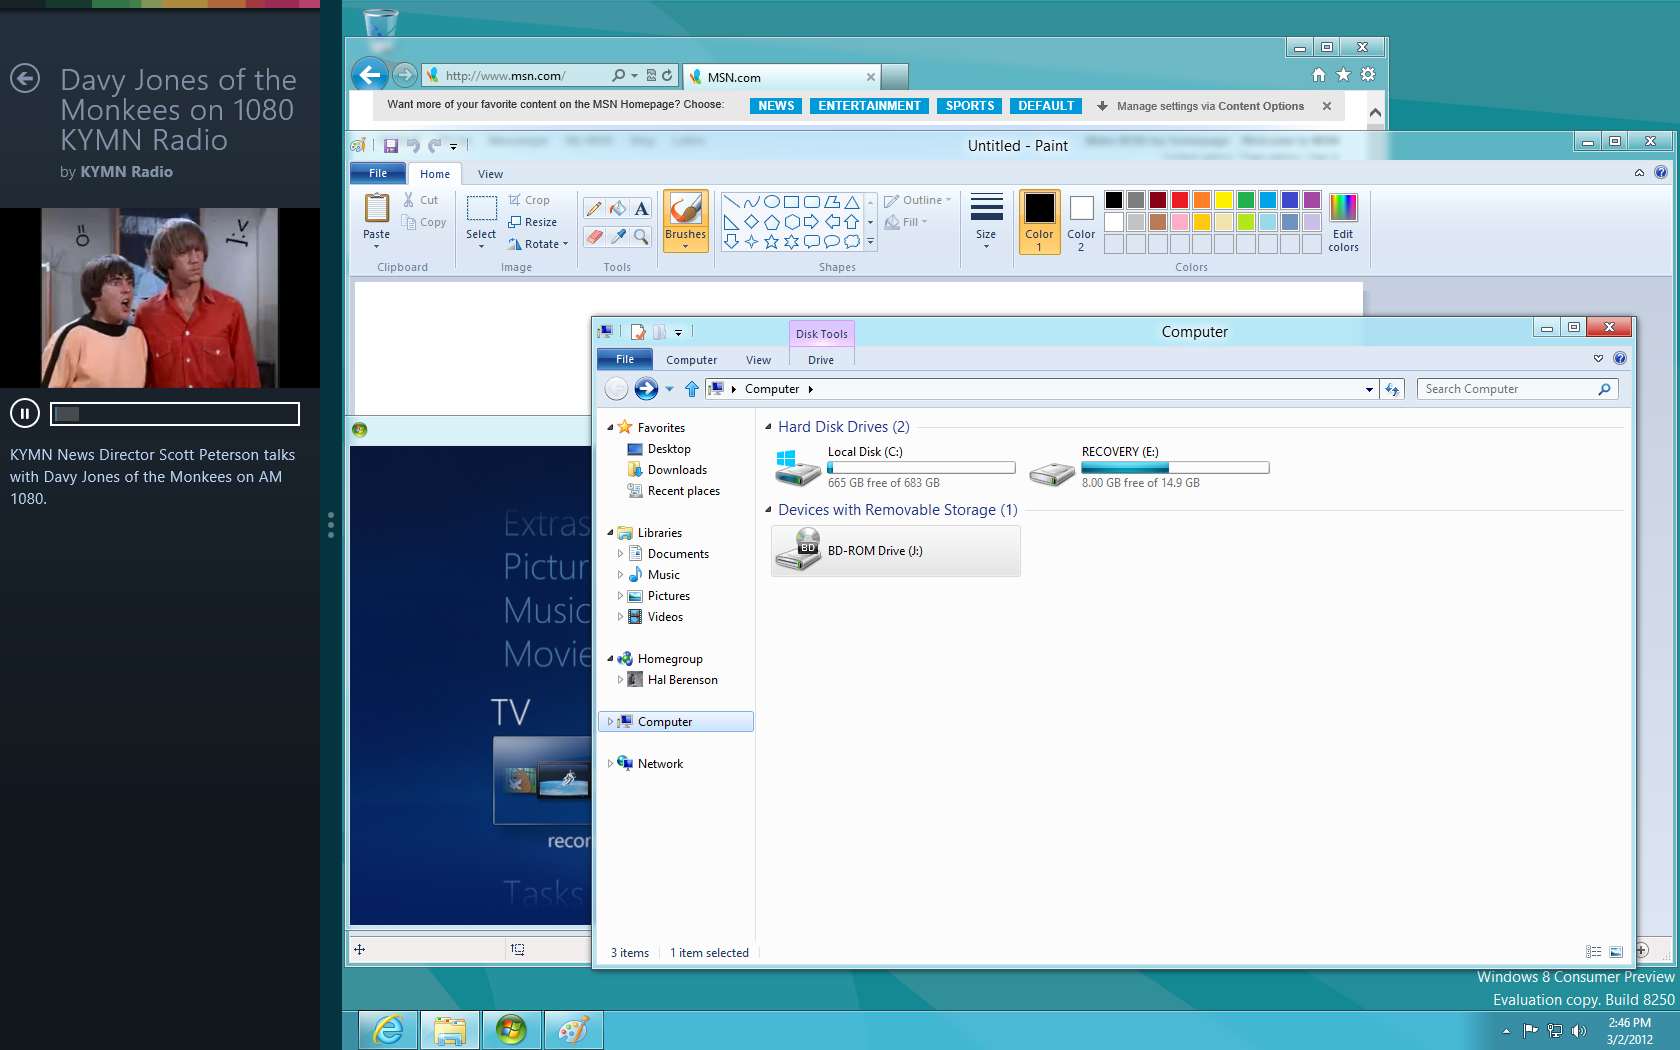 how to take a screenshot on windows 8 desktop